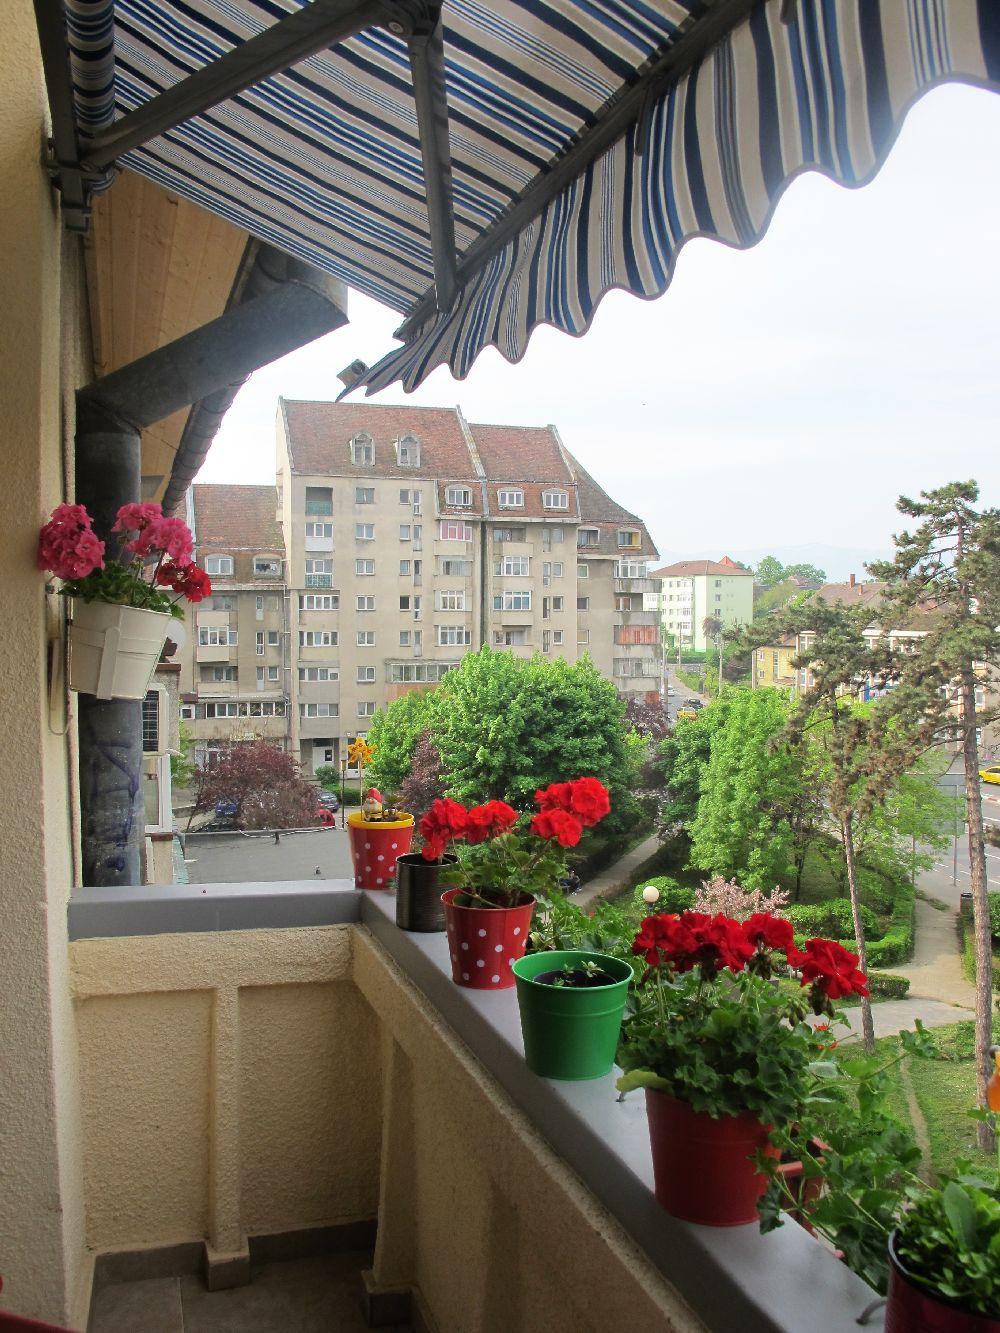 adelaparvu.com despre apartament 3 camere colorat in Sibiu, Foto Adela Parvu (93)